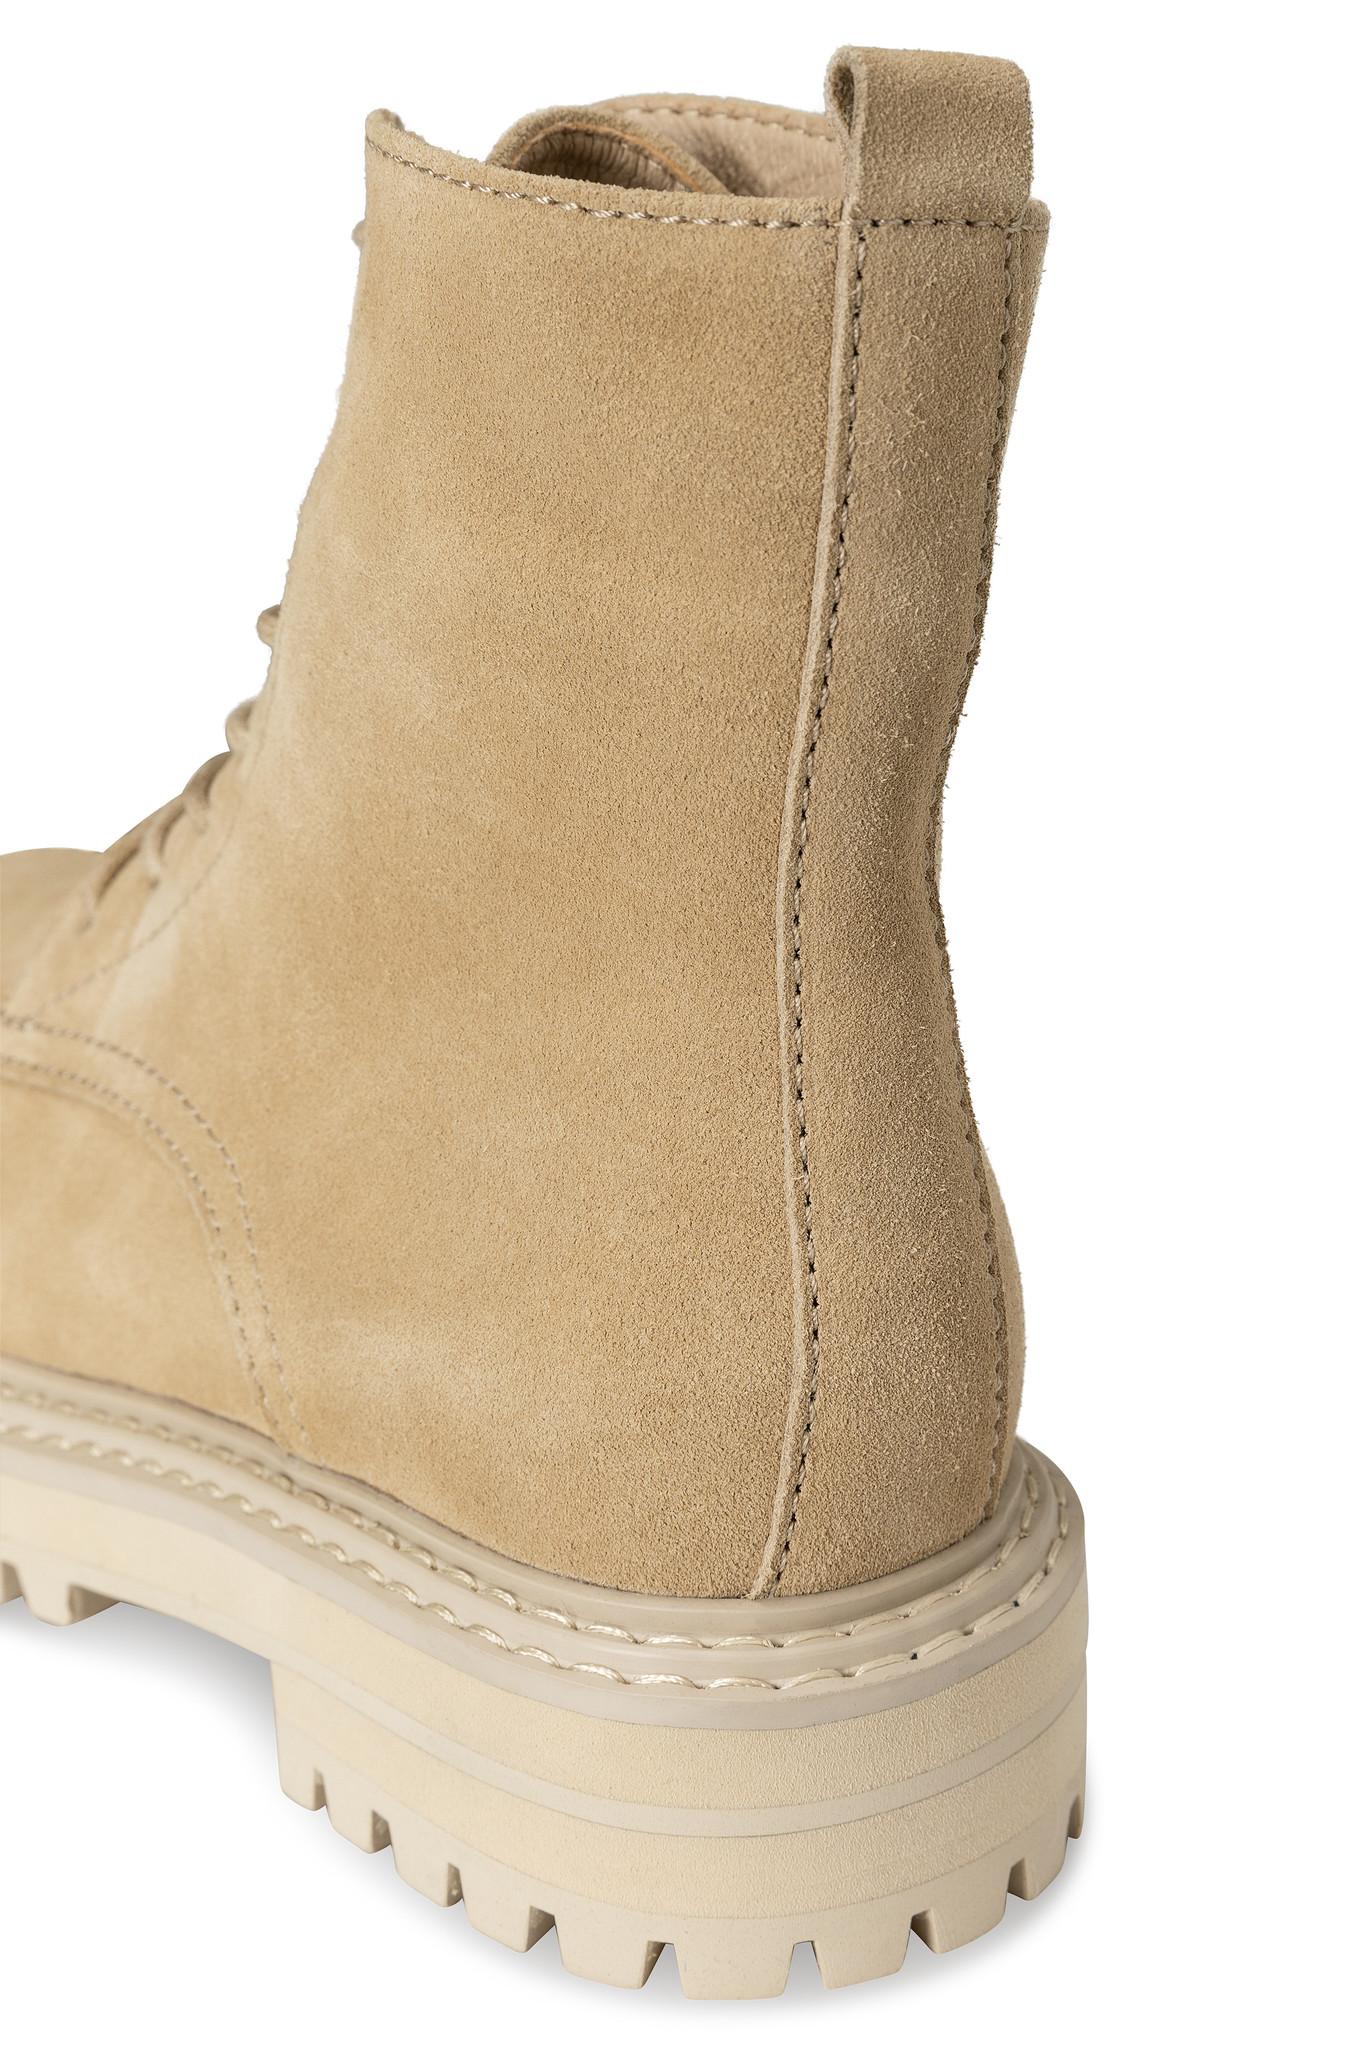 yaya Suede boot with bulk 134377-112-4